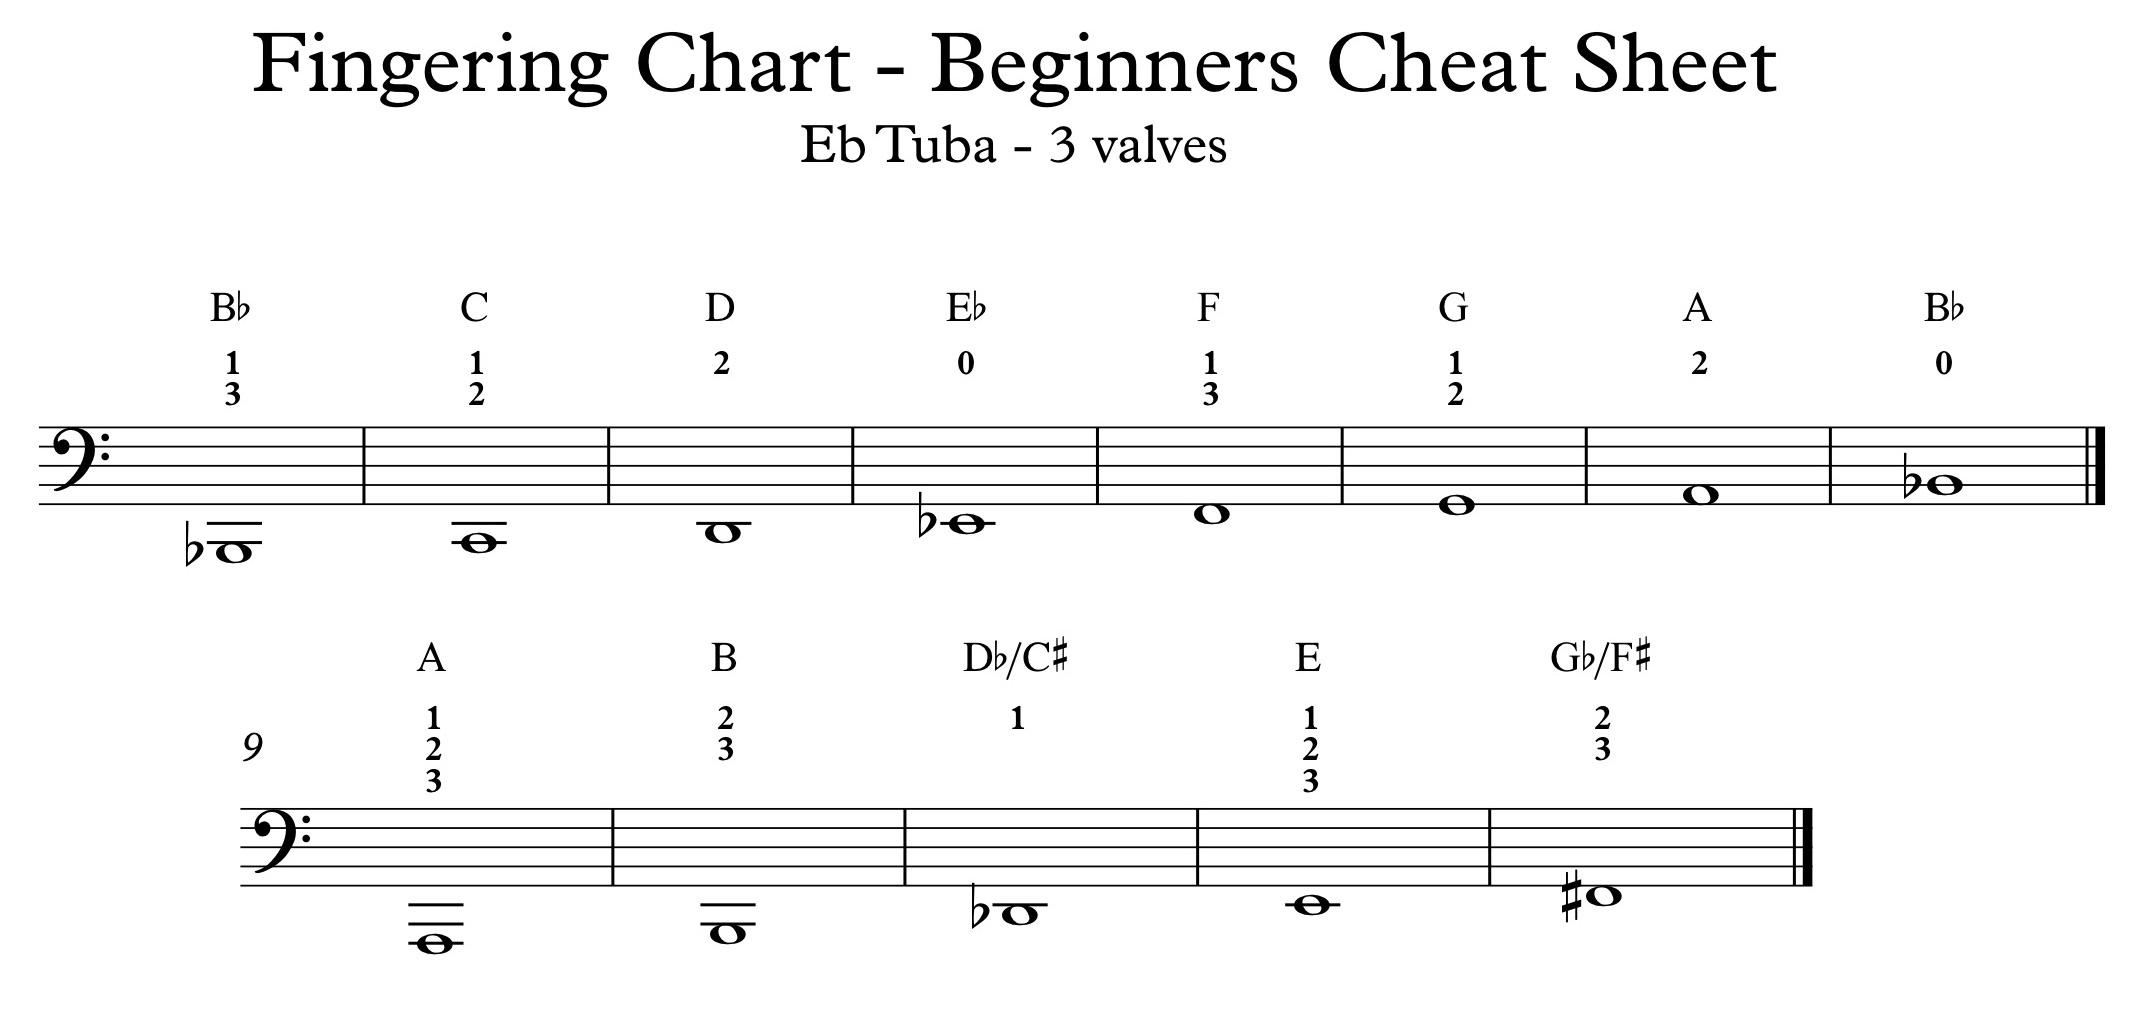 Tuba Fingering EEb 3v Cheat Sheet.jpg